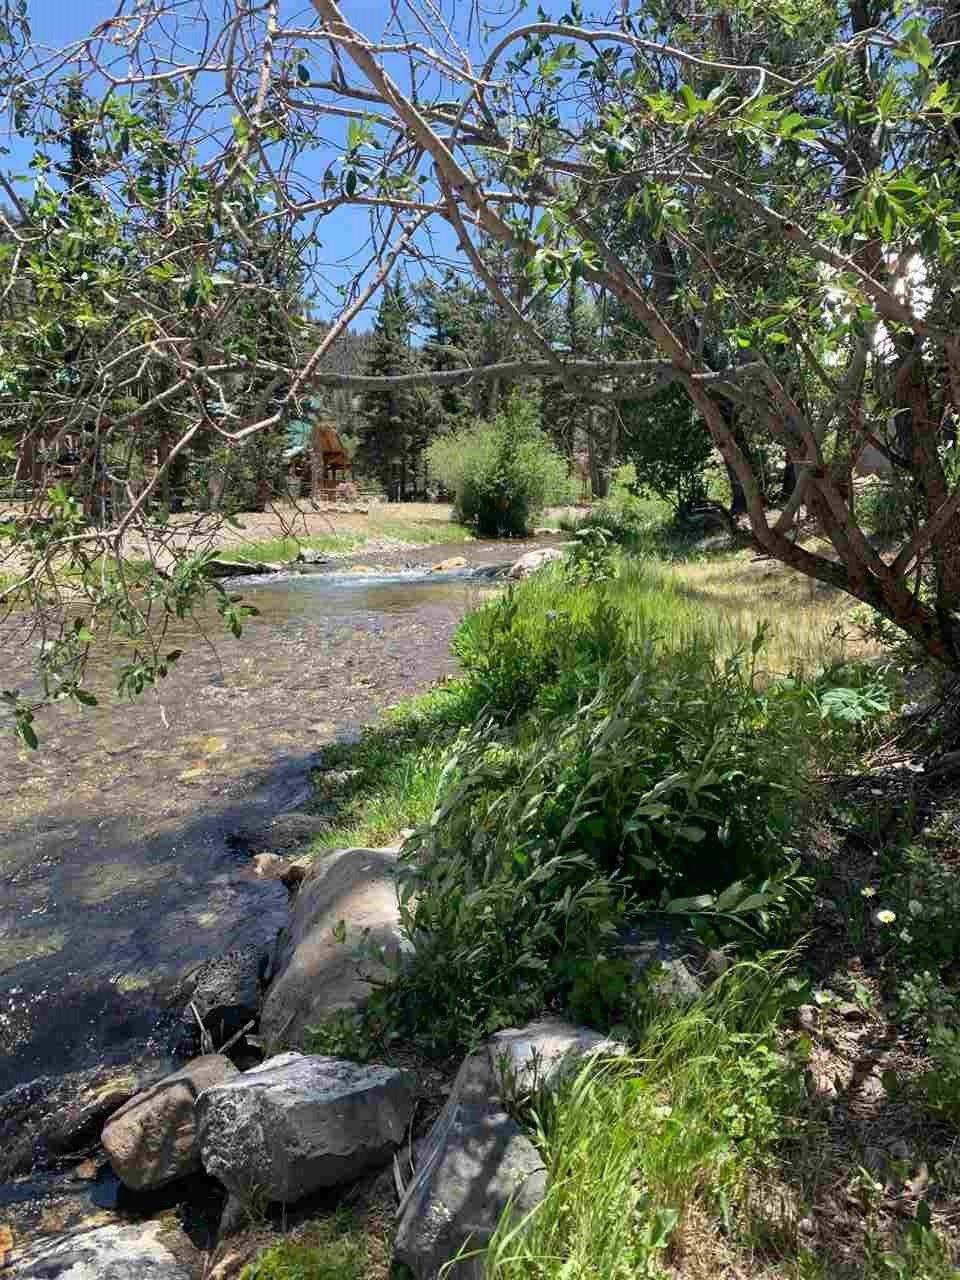 Photo for Dorris Gene Trail, Red River, NM 87558 (MLS # 105309)